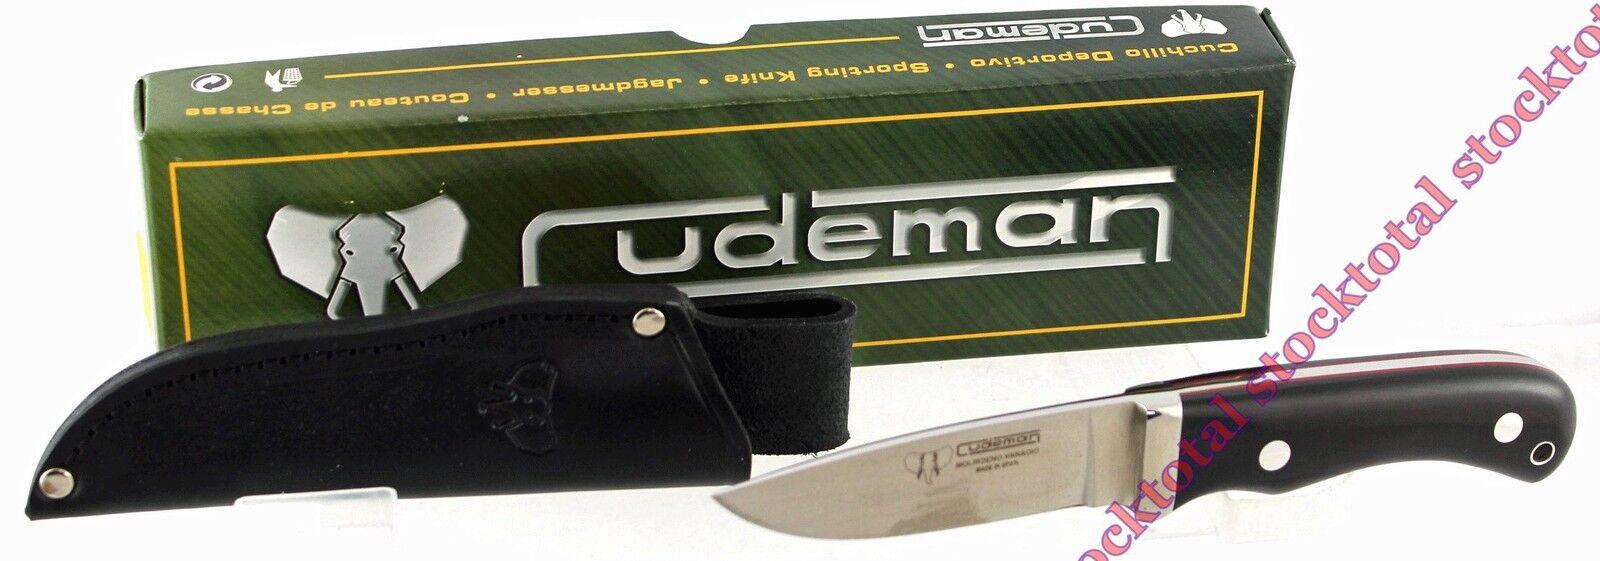 Hunting knife cudeman 116m micarta handle 116m knife messer